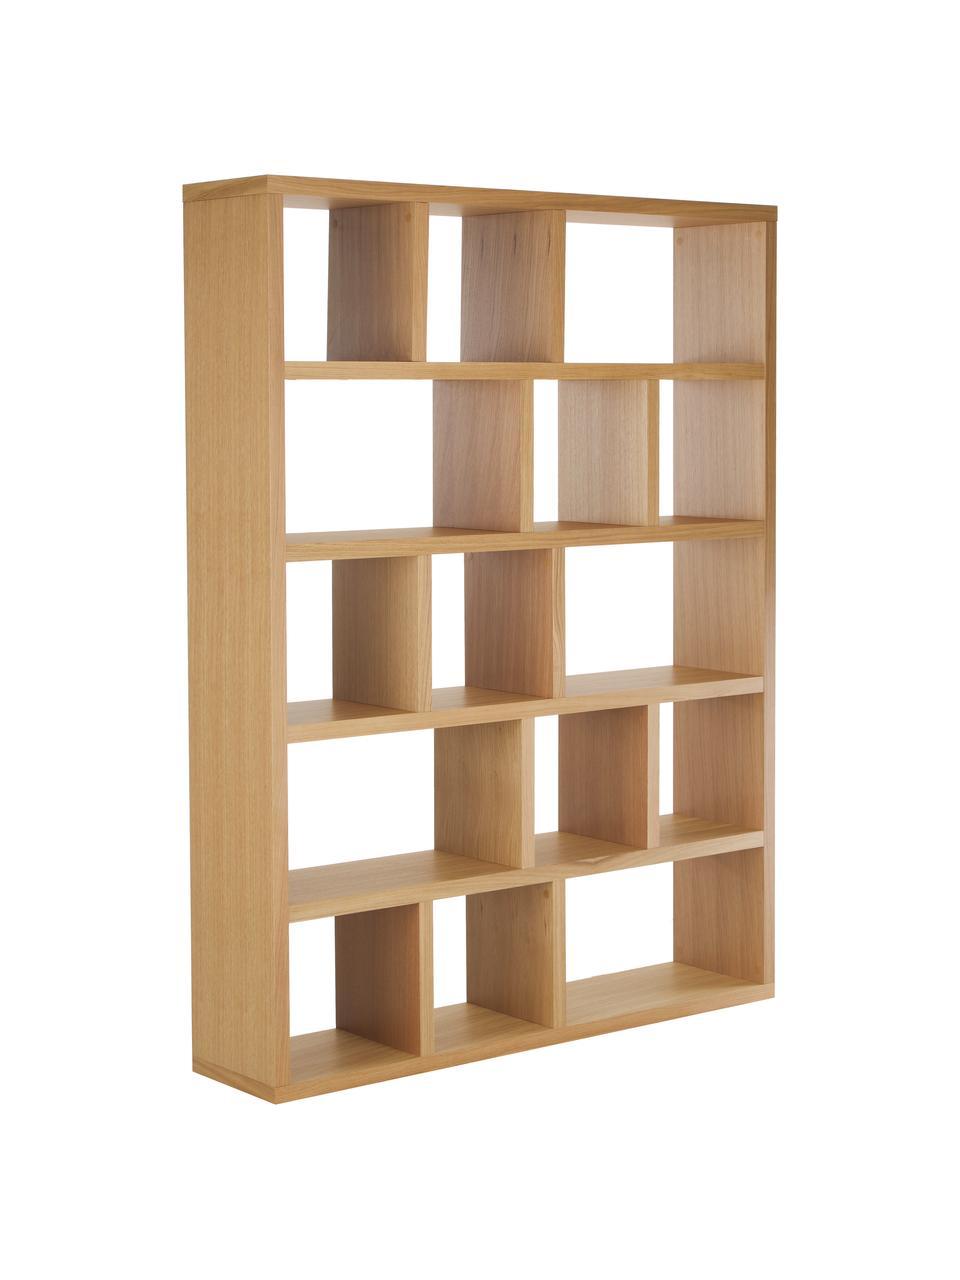 Großes Bücherregal Portlyn mit Eichenholzfurnier, Oberfläche: Echtholzfurnier., Eichenholz, 150 x 198 cm